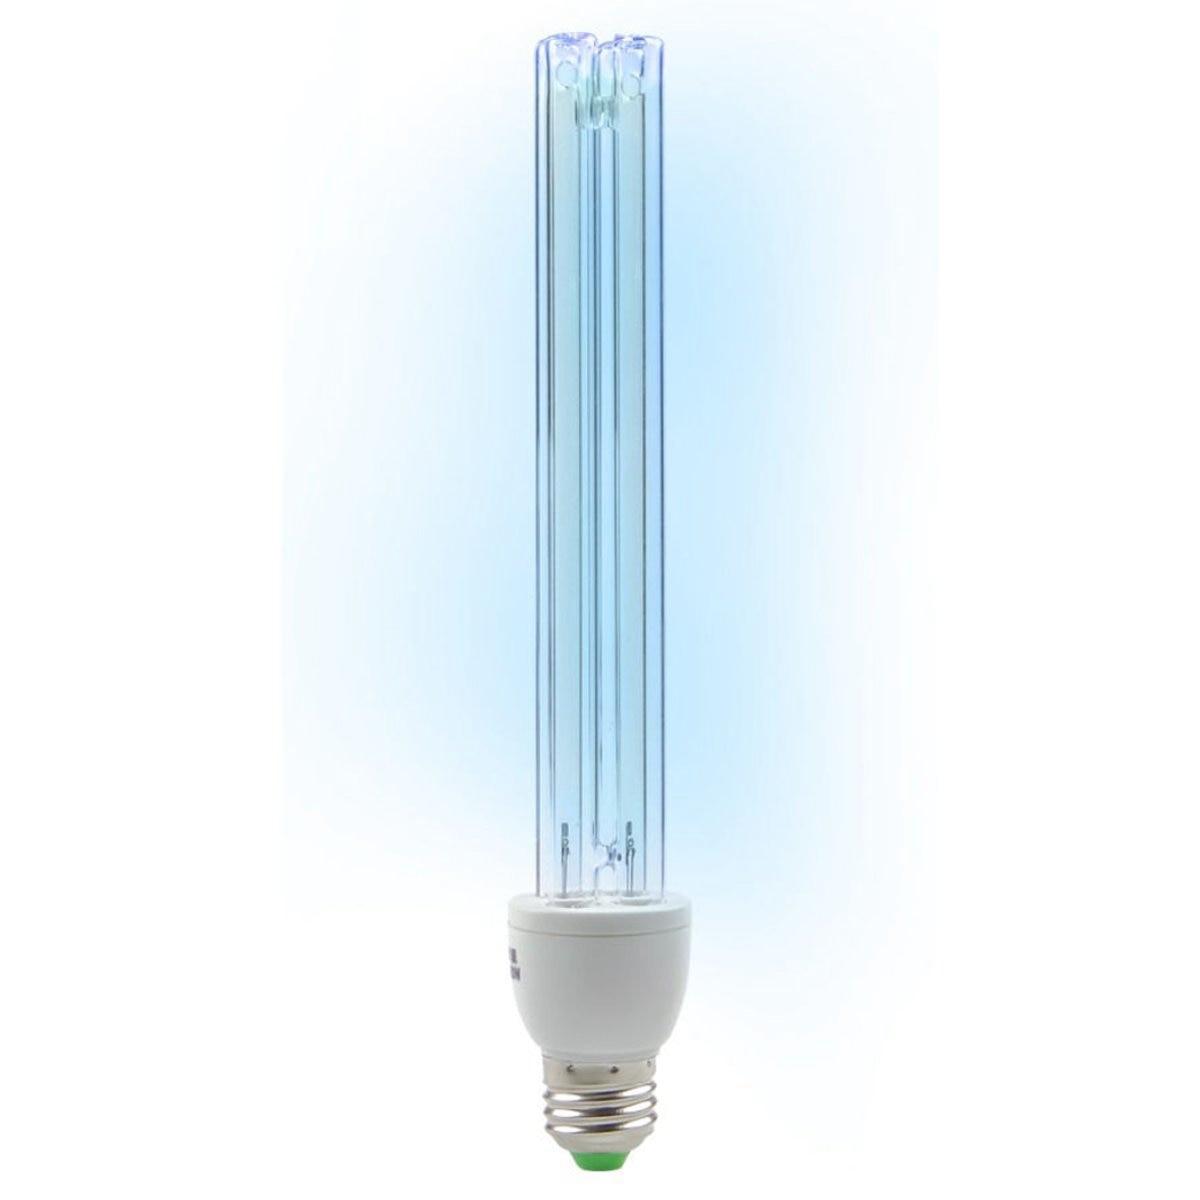 Ultraviolet UV Lamp Light Tube Bulb E27 20W AC220V UVC Disinfection Lamp Ozone Sterilization Mites Lights Germicidal Lamp Bulb